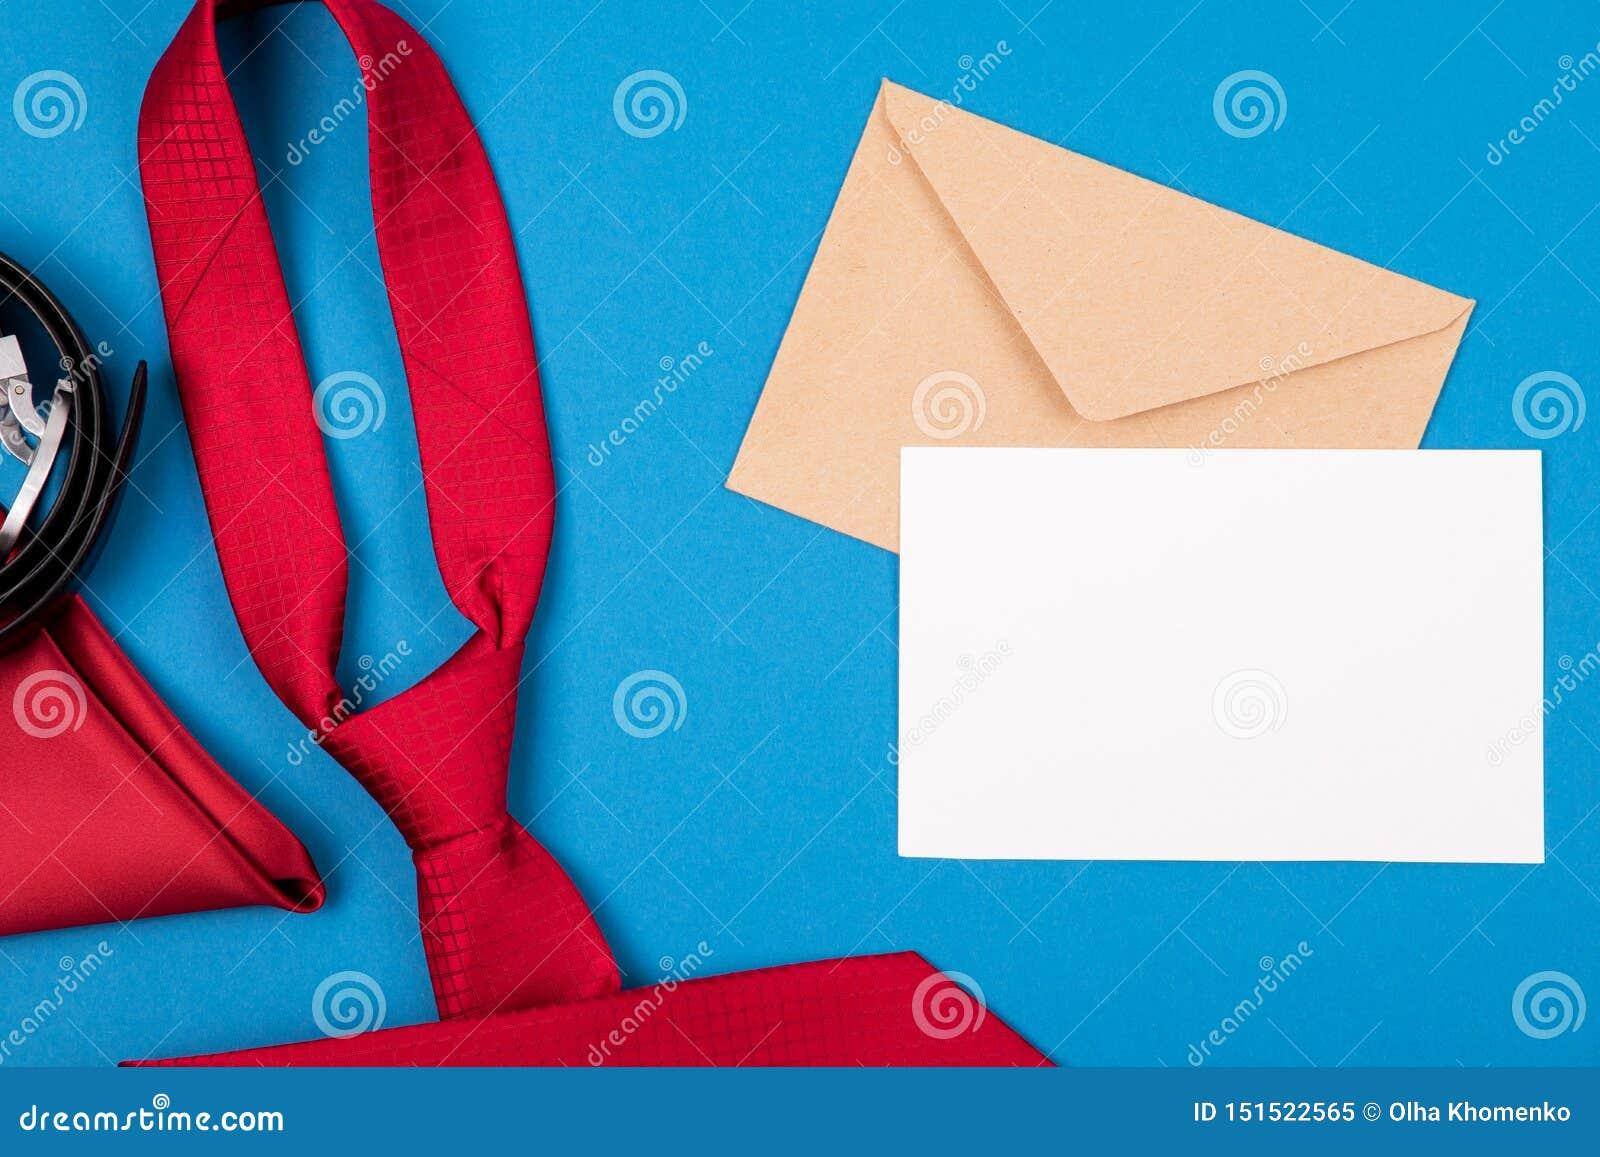 De samenstelling van rode halsband, in eigen zak steekt vierkant, riem, ambachtenvelop en lege kaart op blauwe cyaanachtergrond